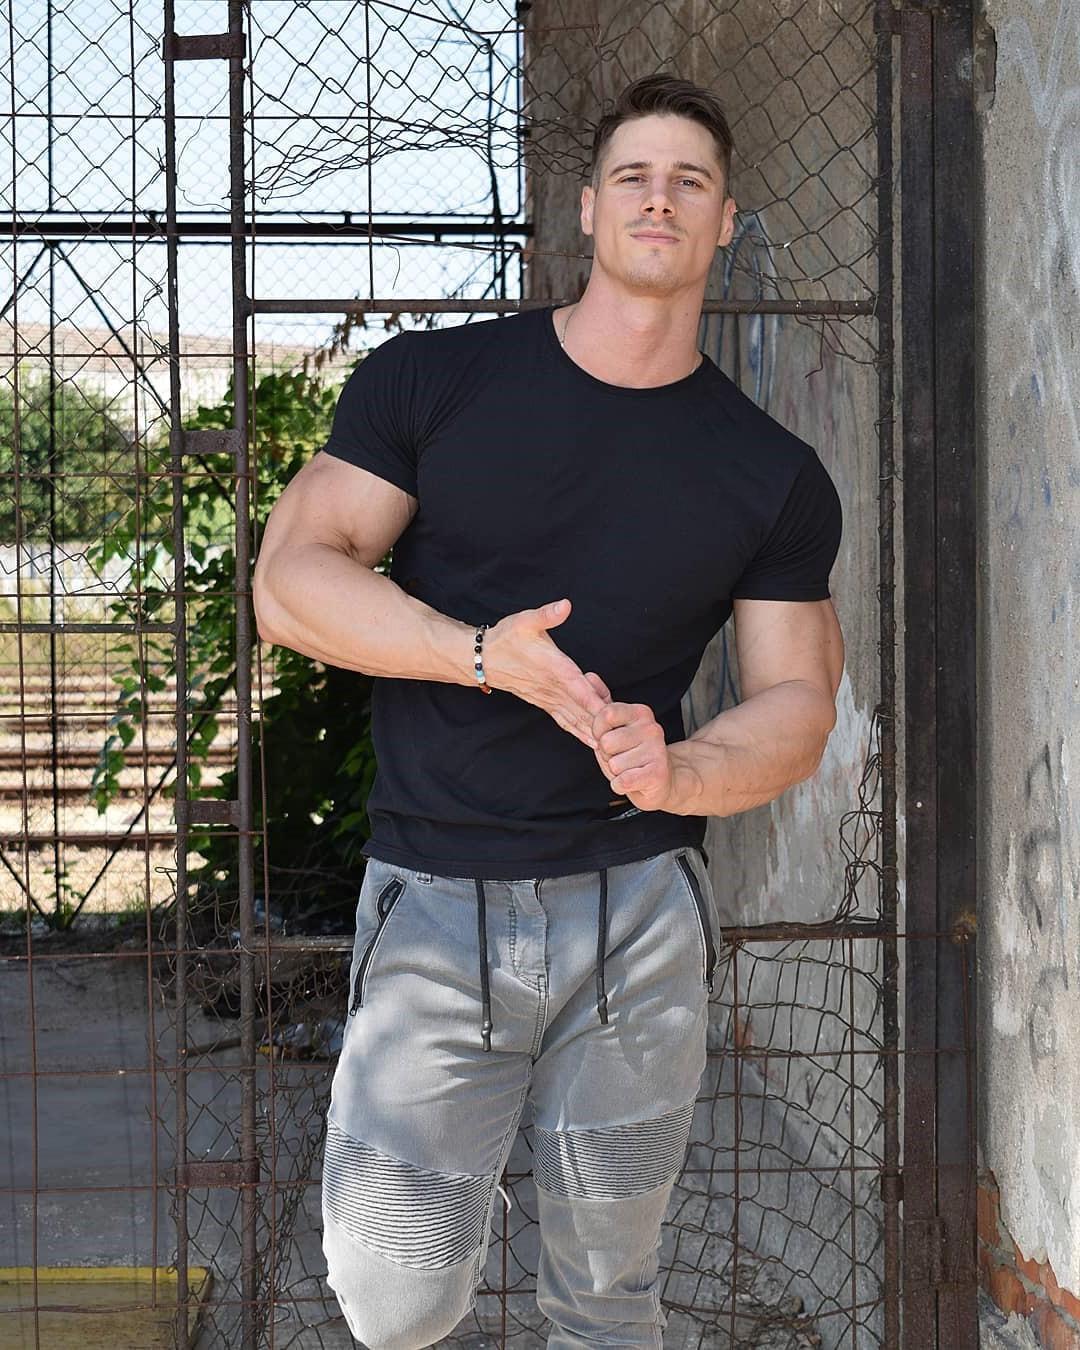 attractive-eastern-european-men-voros-mate-hot-hungarian-muscular-dude